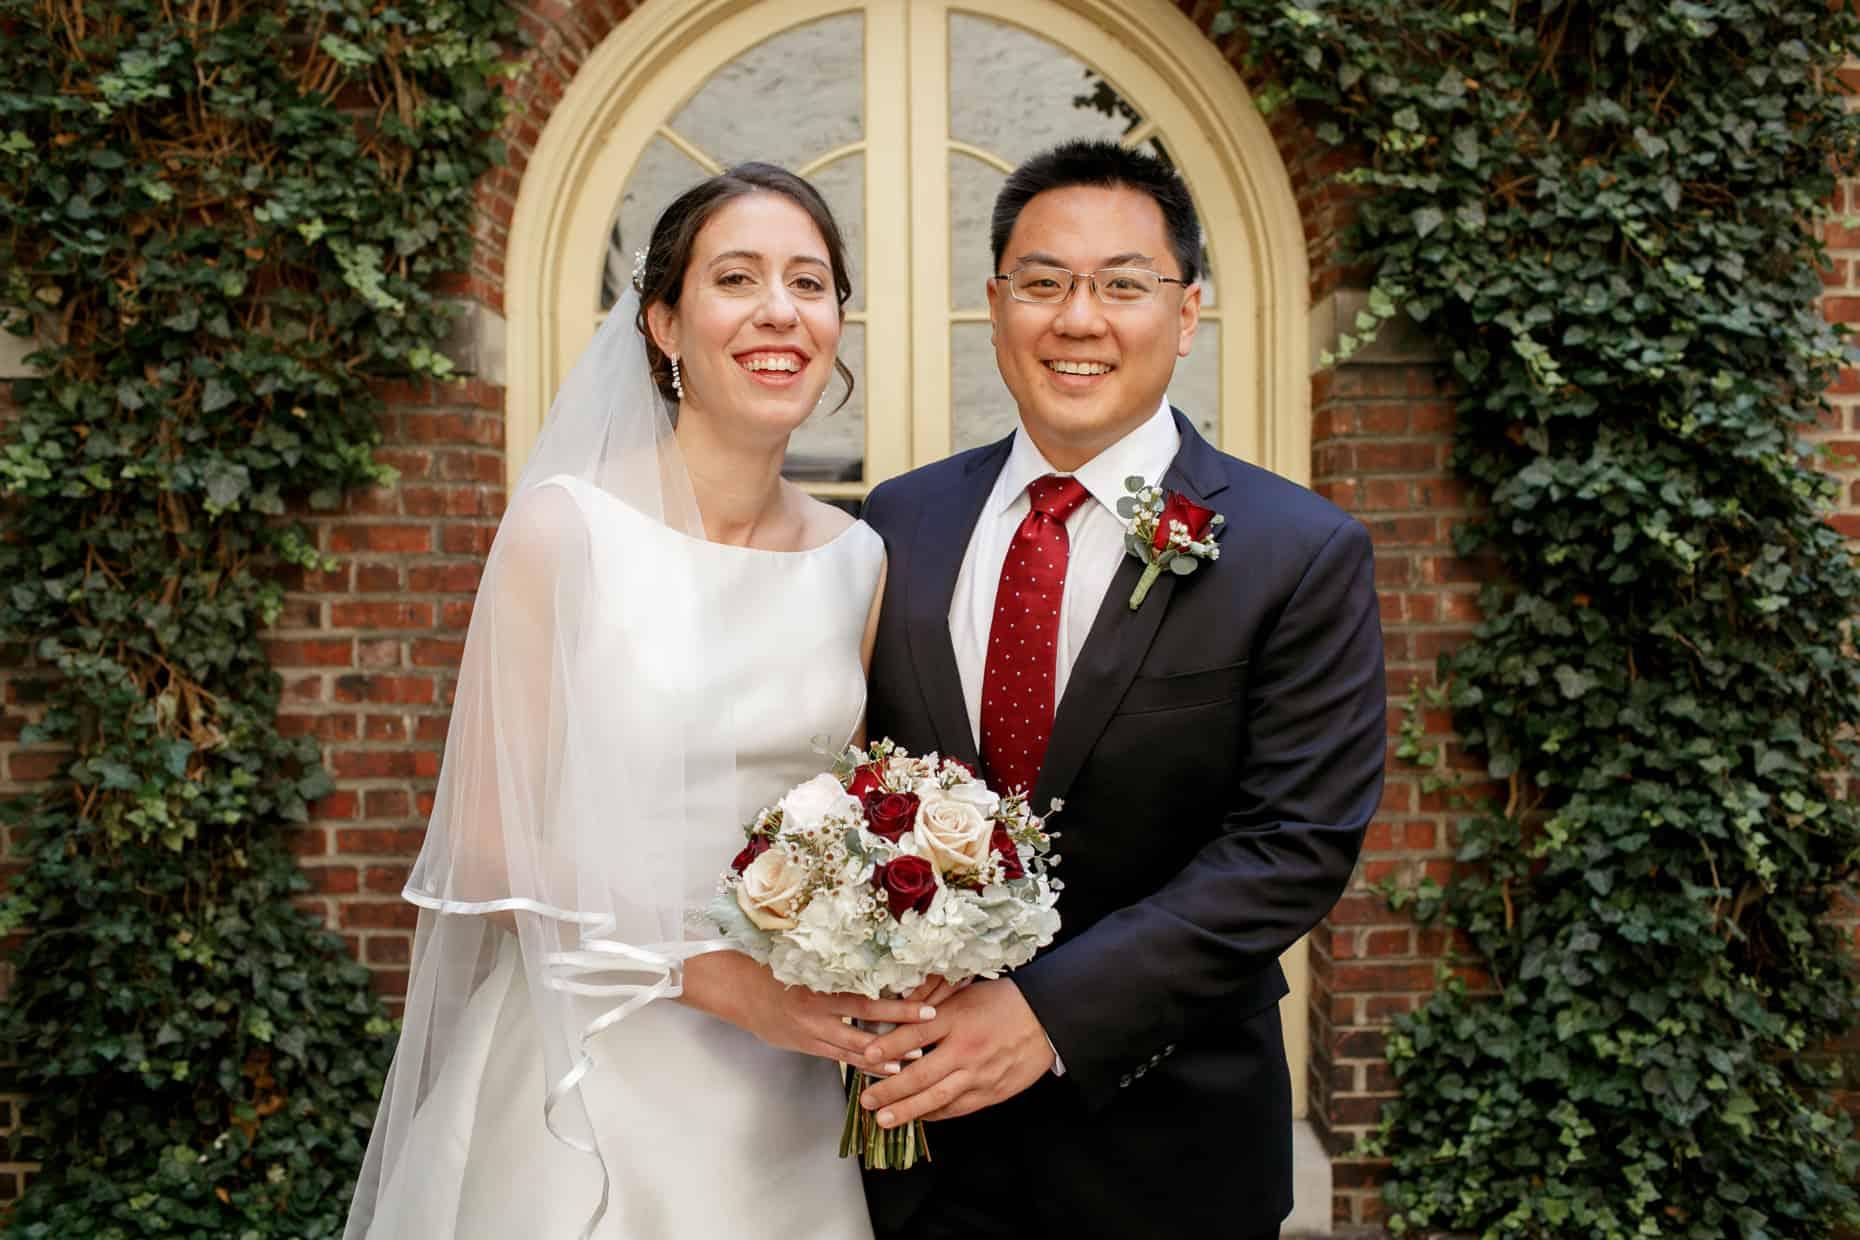 Colonial Dames Society wedding